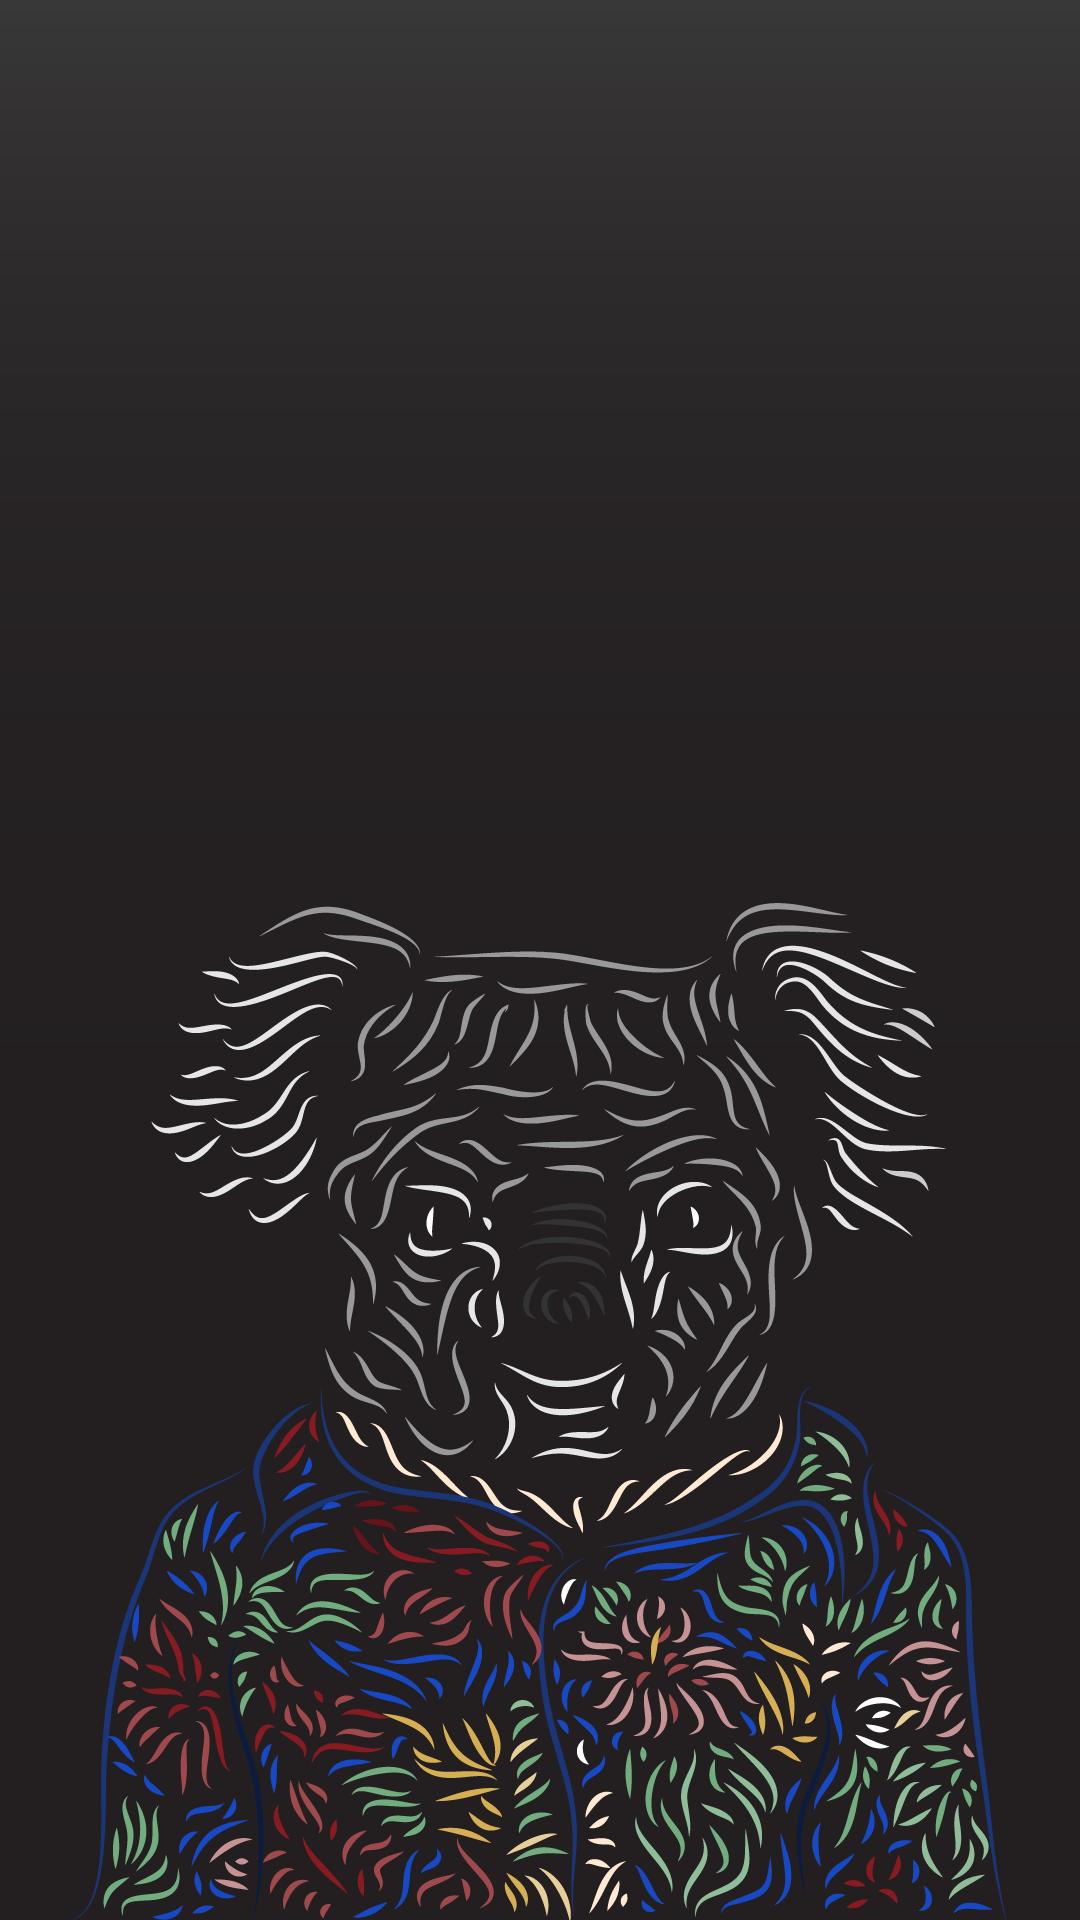 Download Wallpaper Koala Cartoon - f02cb6b1c1d3d5b201bf2ac444d4b921  Picture_431142   .png